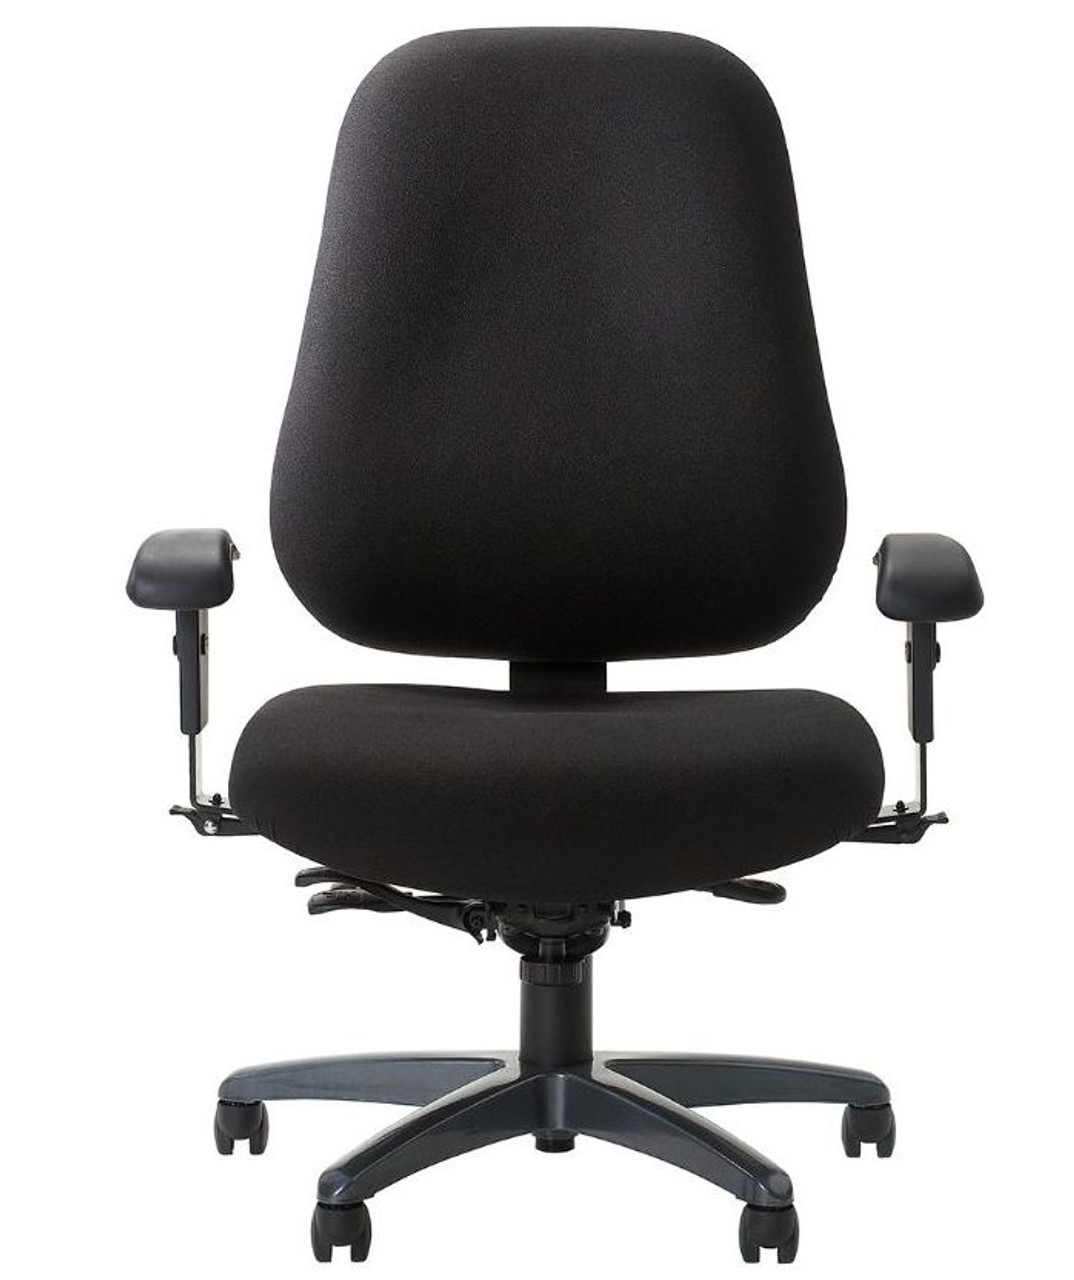 Admirable Ki Pilot Big And Tall Ergonomic Task Chair Download Free Architecture Designs Viewormadebymaigaardcom